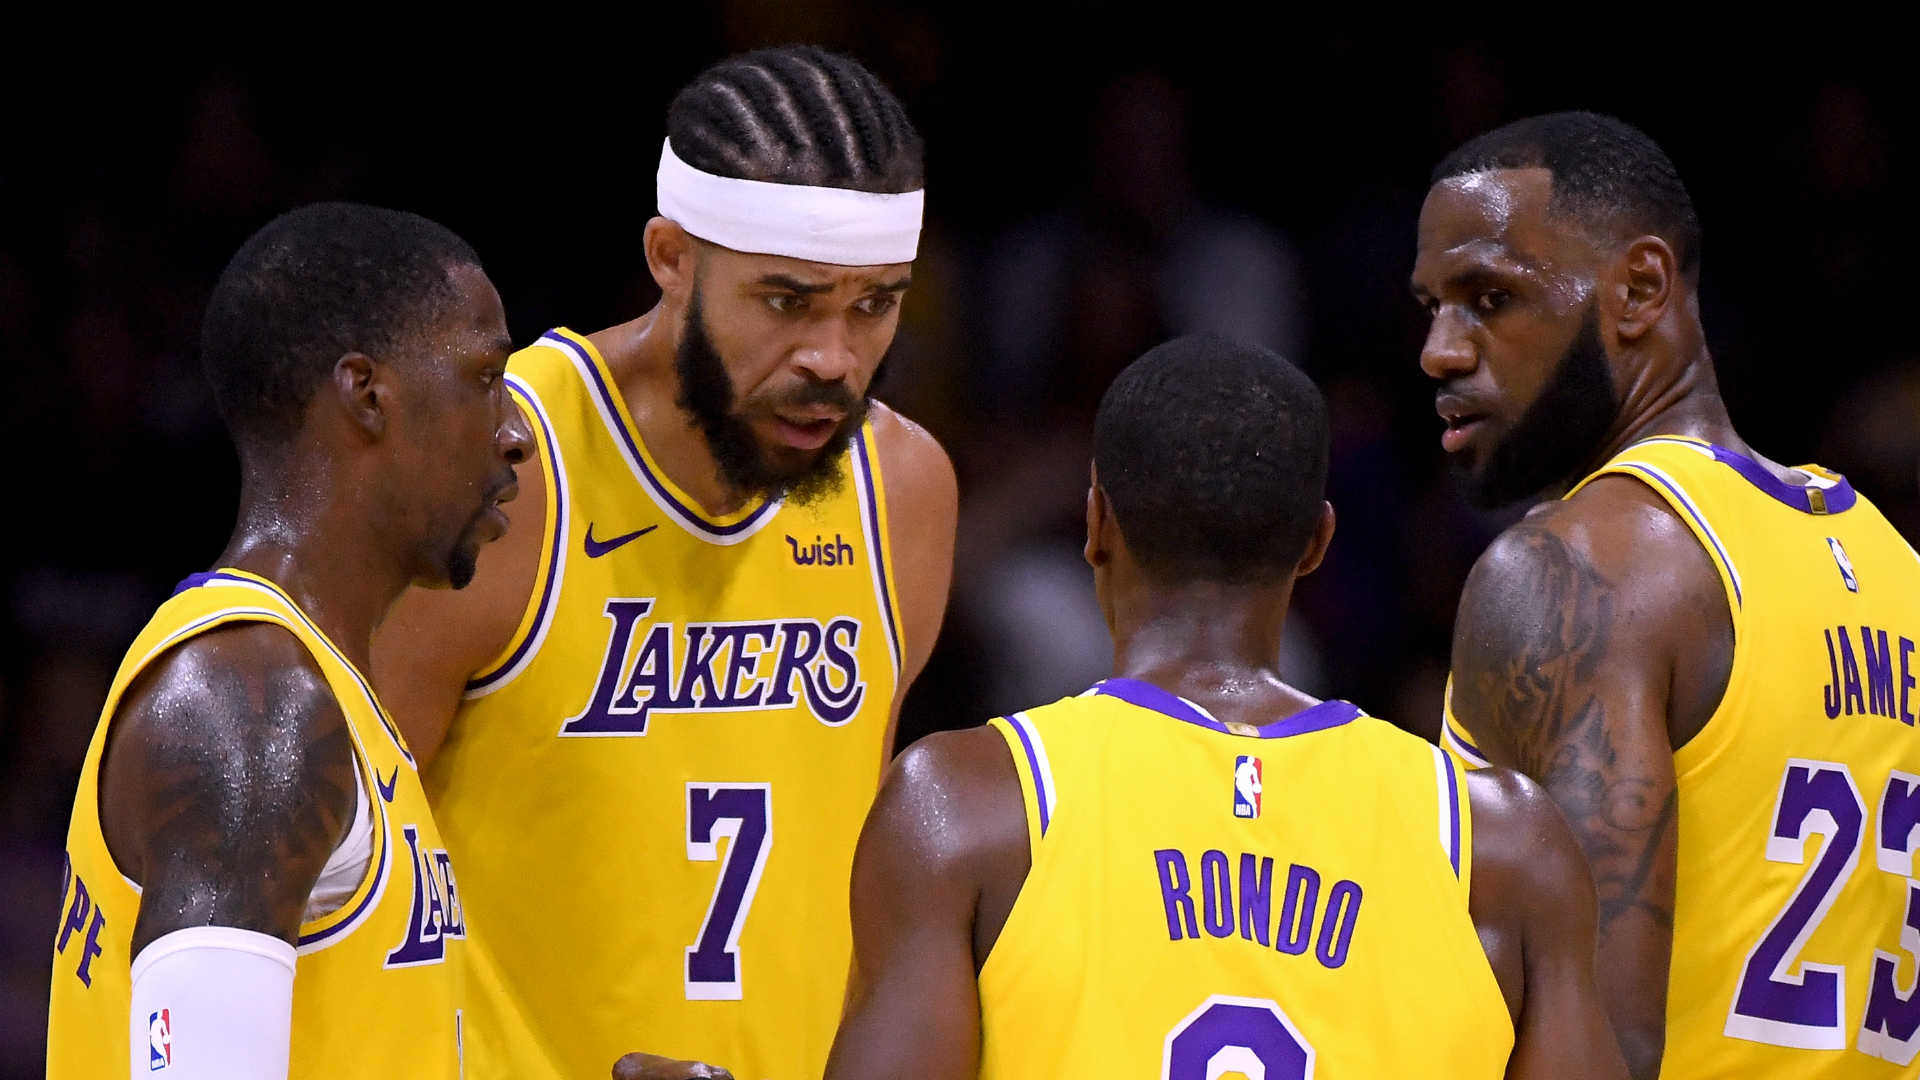 Лейкерс — Хьюстон. Прогноз на матч 21 октября 2018. НБА